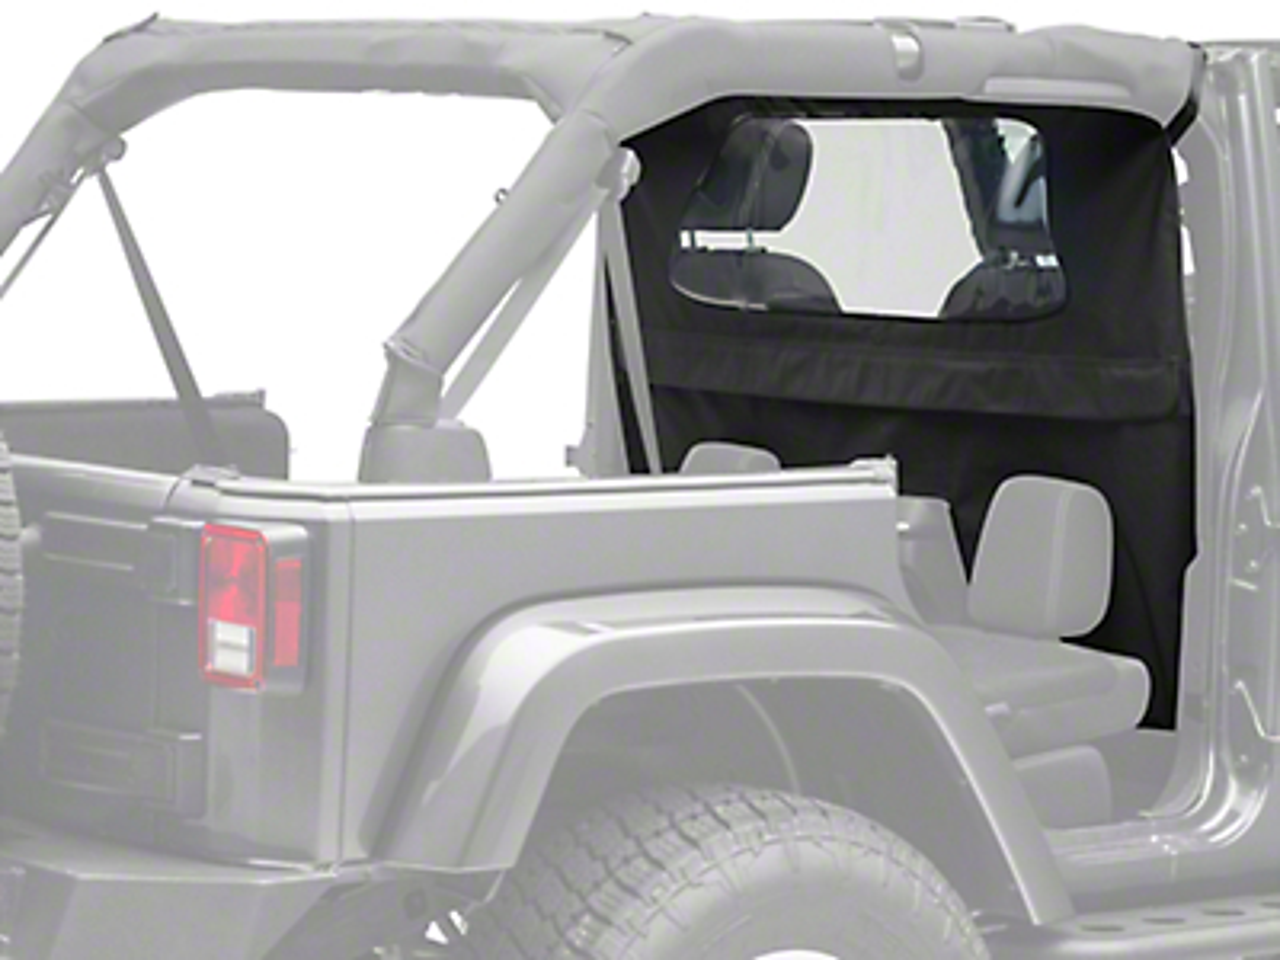 TruShield Wind Breaker - Black Diamond (07-18 Jeep Wrangler JK 4 Door)